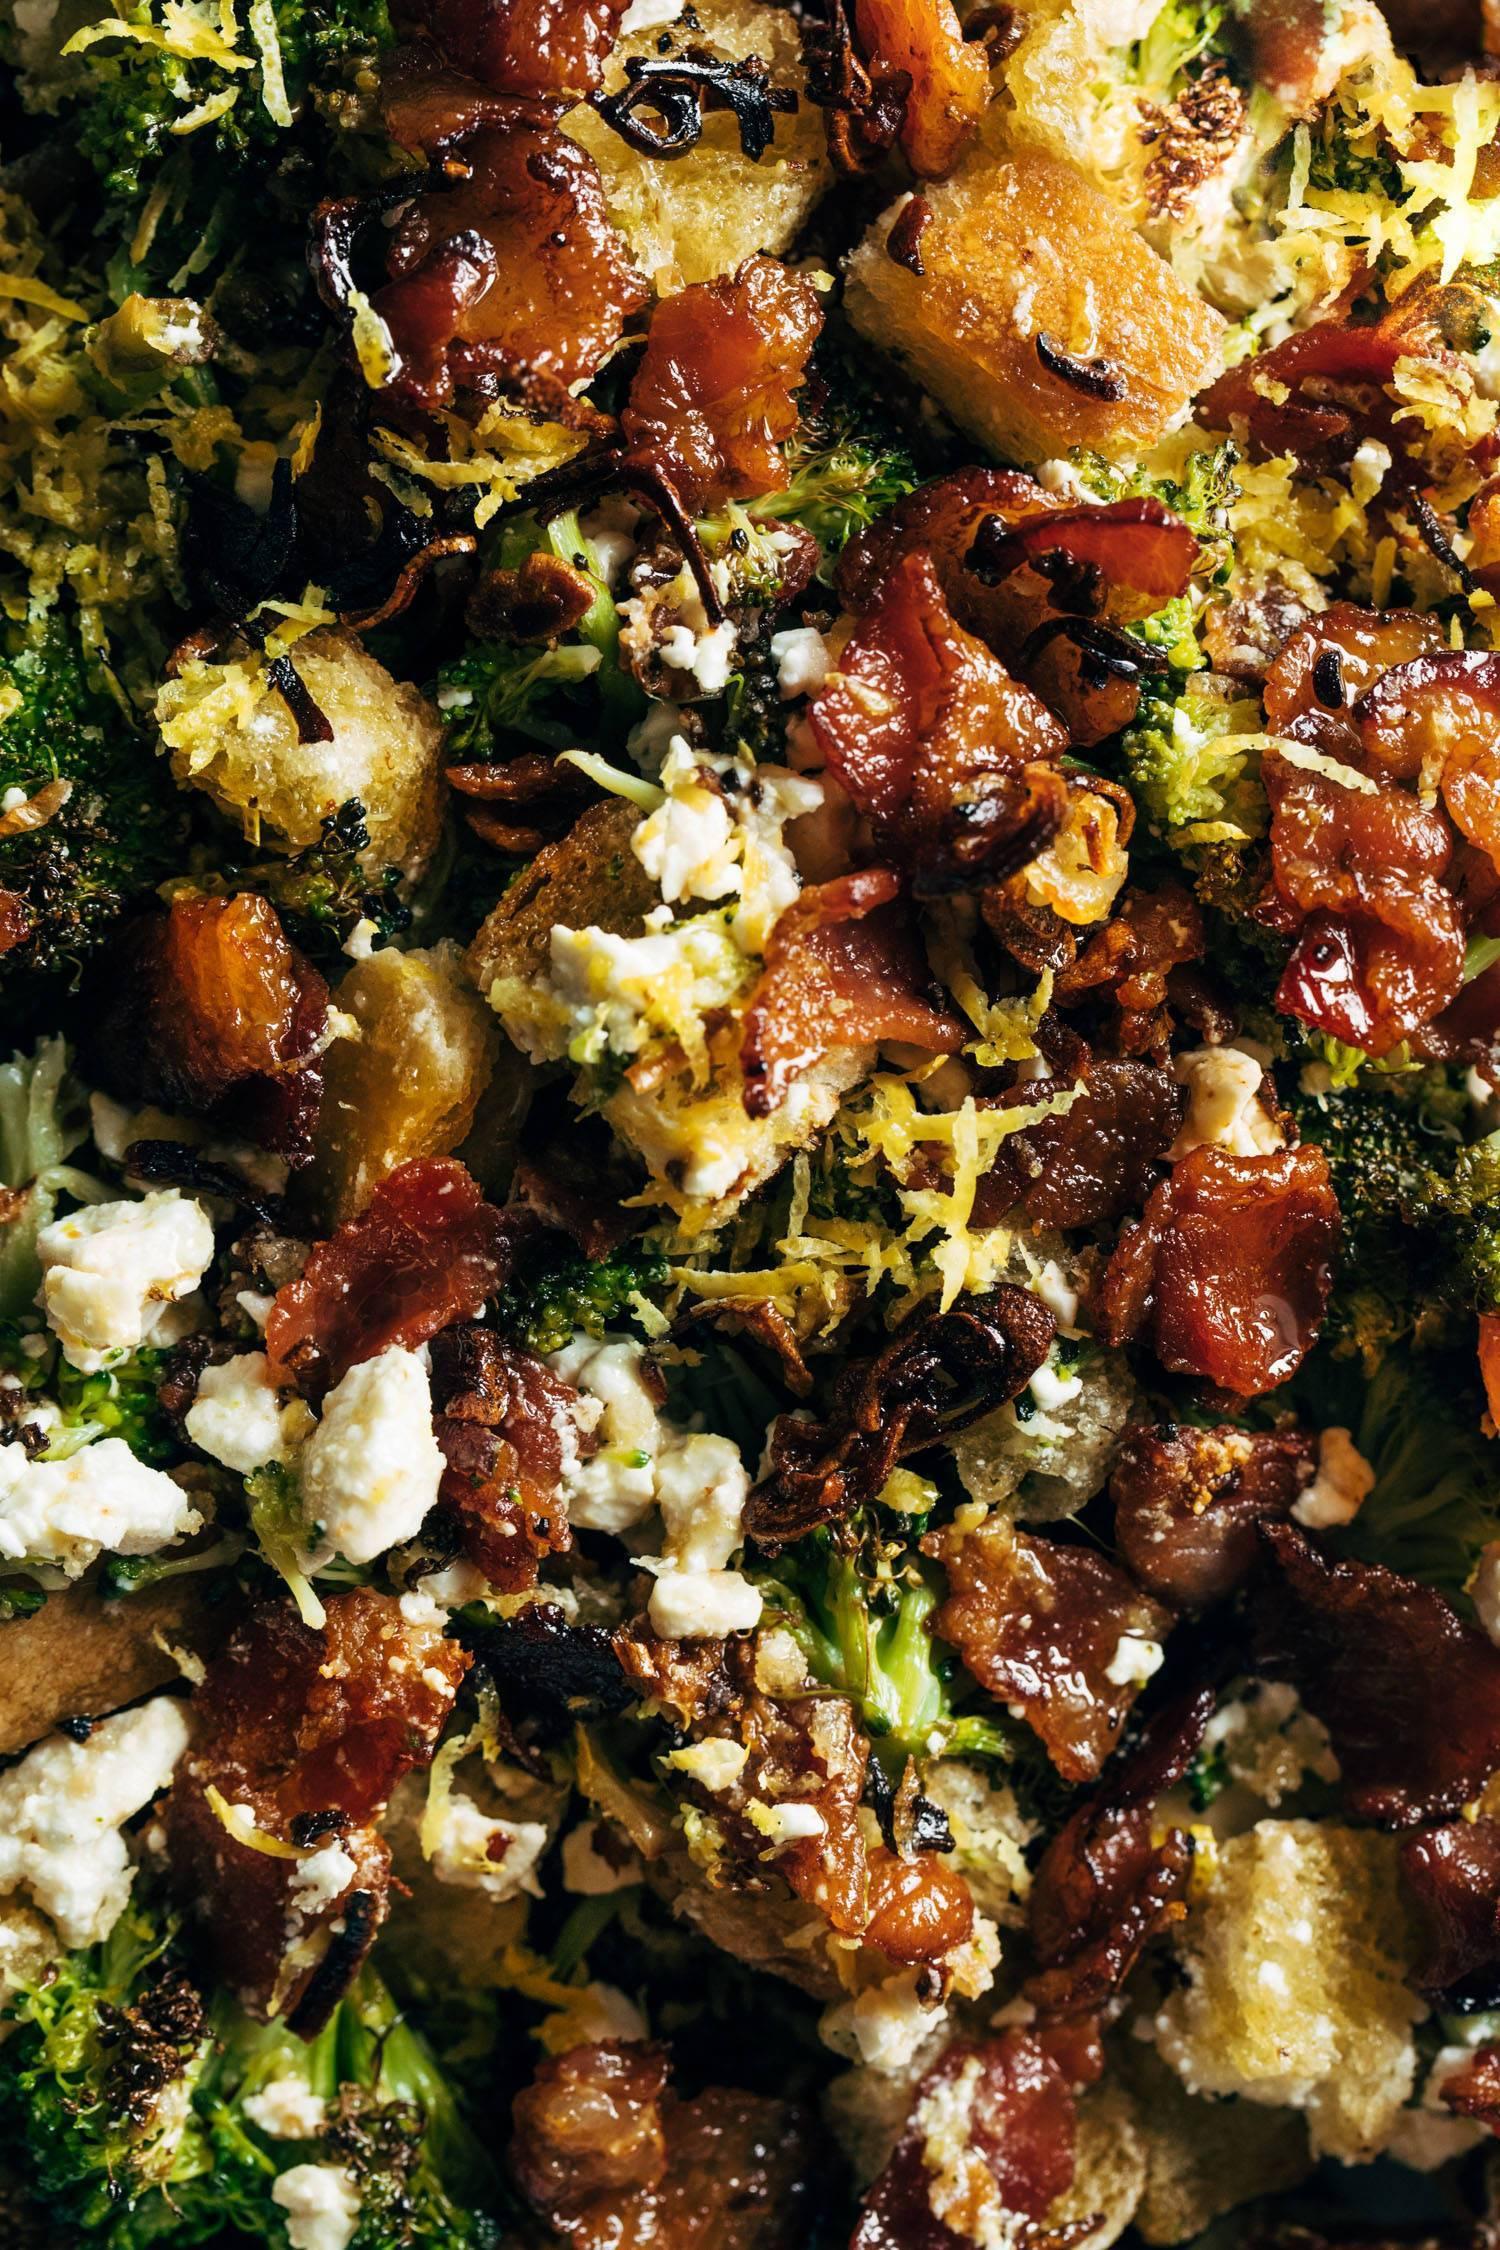 Liz's Roasted Broccoli Salad